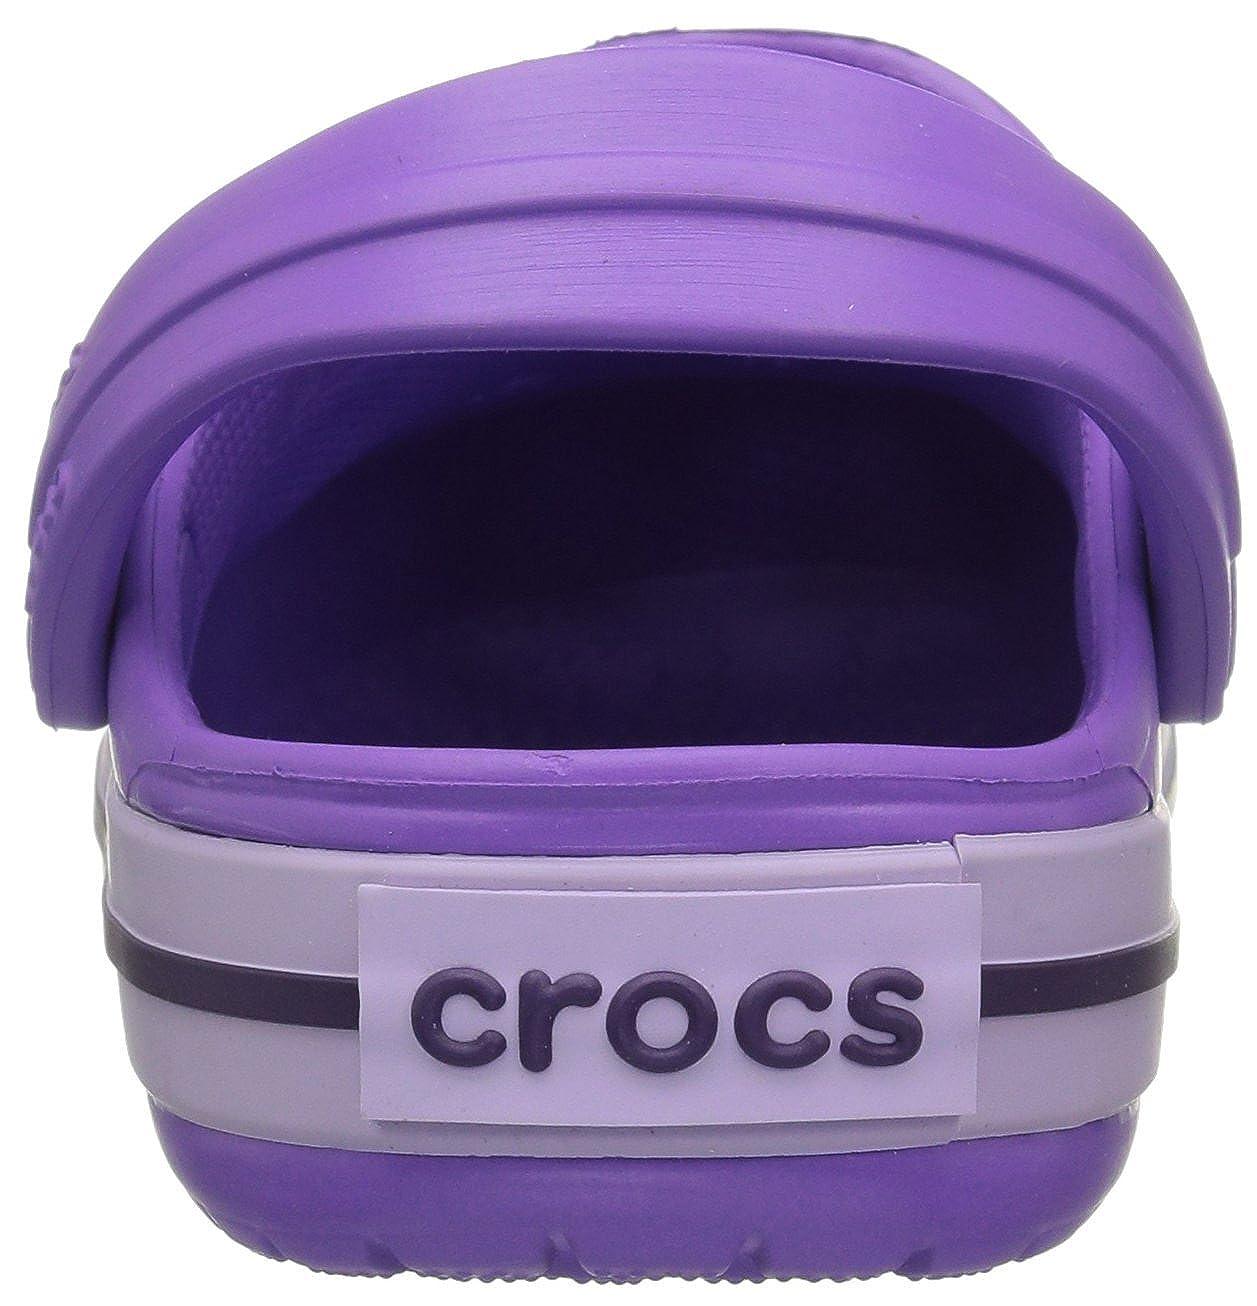 Slip On Water Shoe for Toddlers Girls Lightweight Crocs Kids Crocband Clog Boys